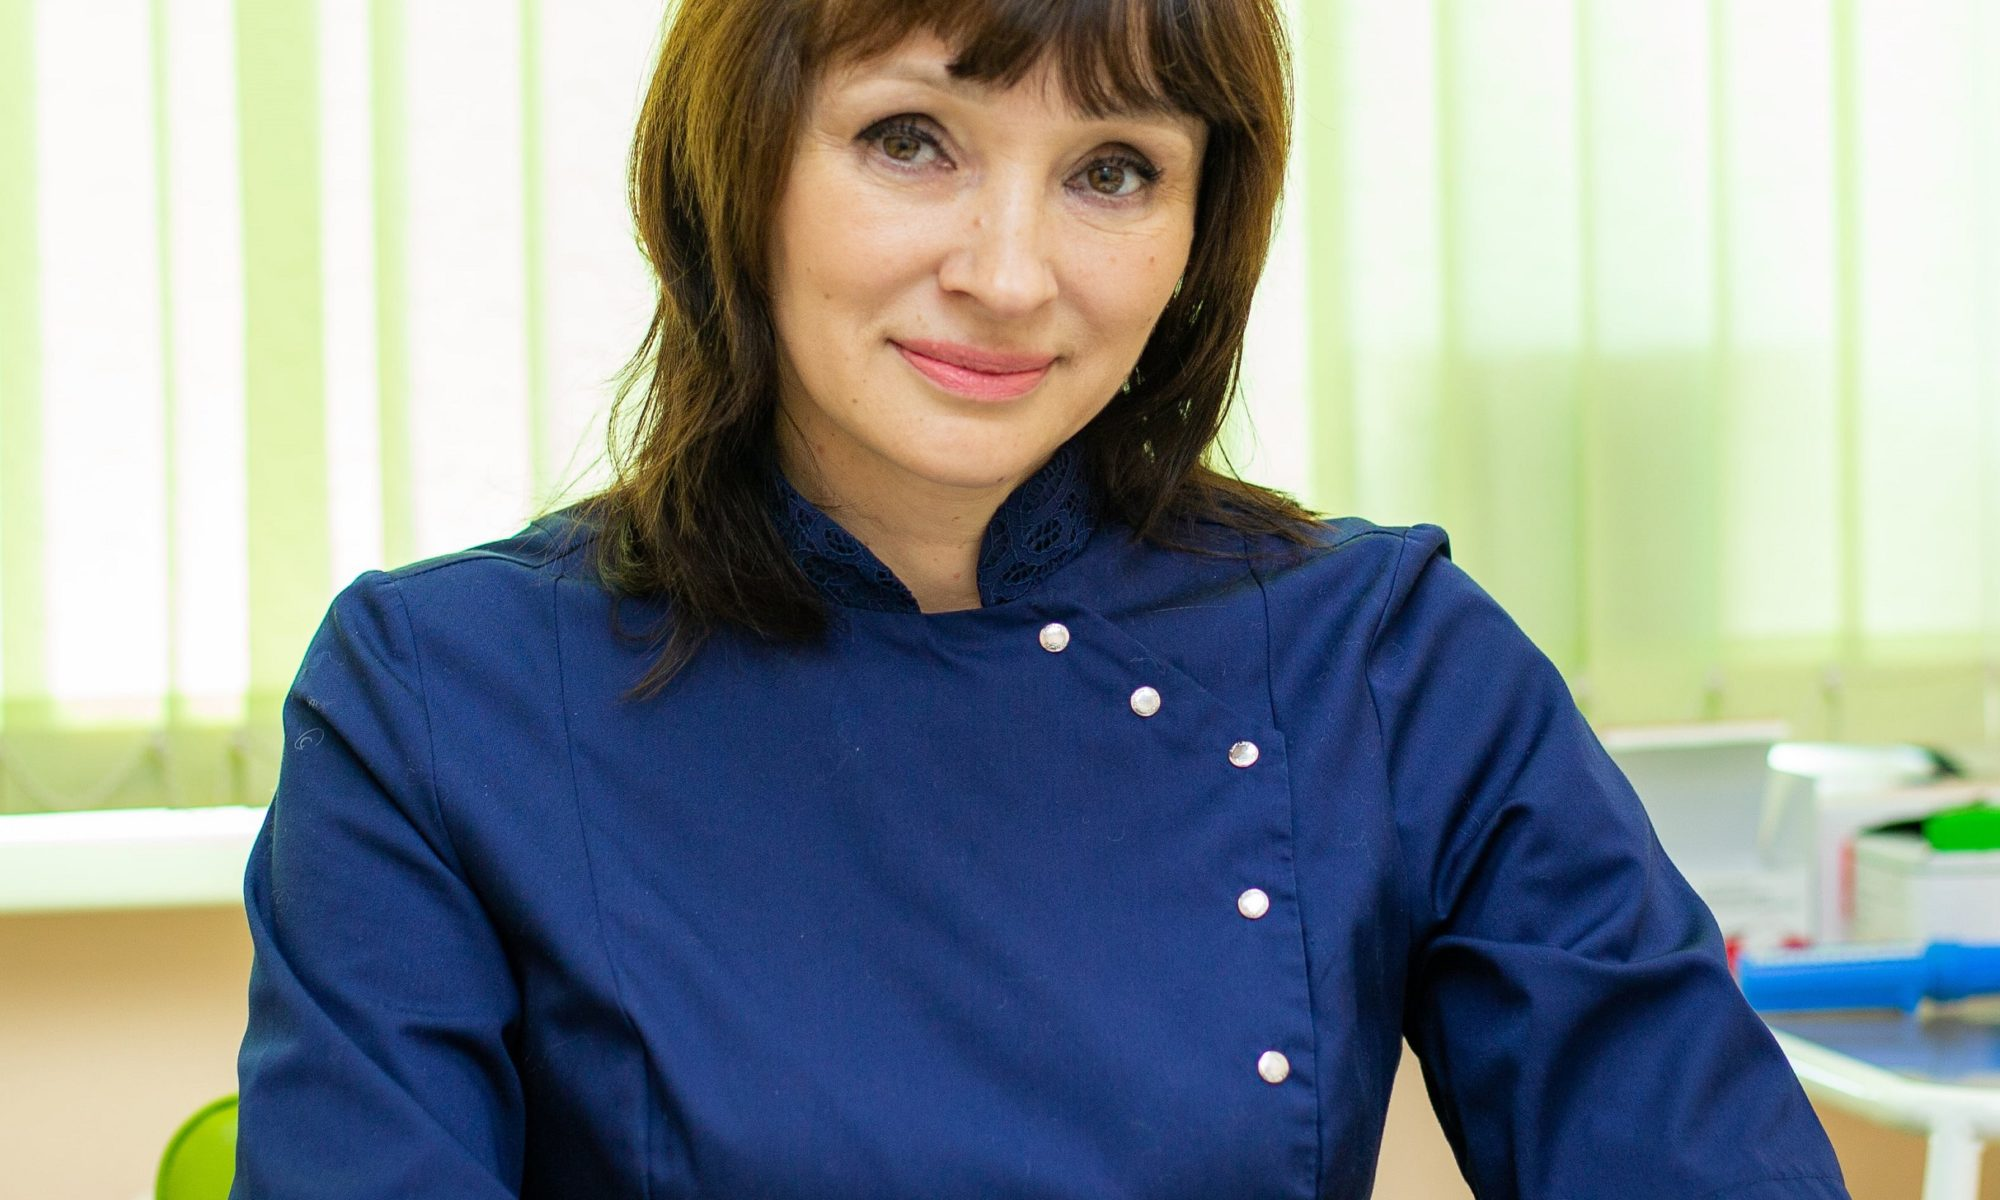 Волынчикова Наталья Викторовна